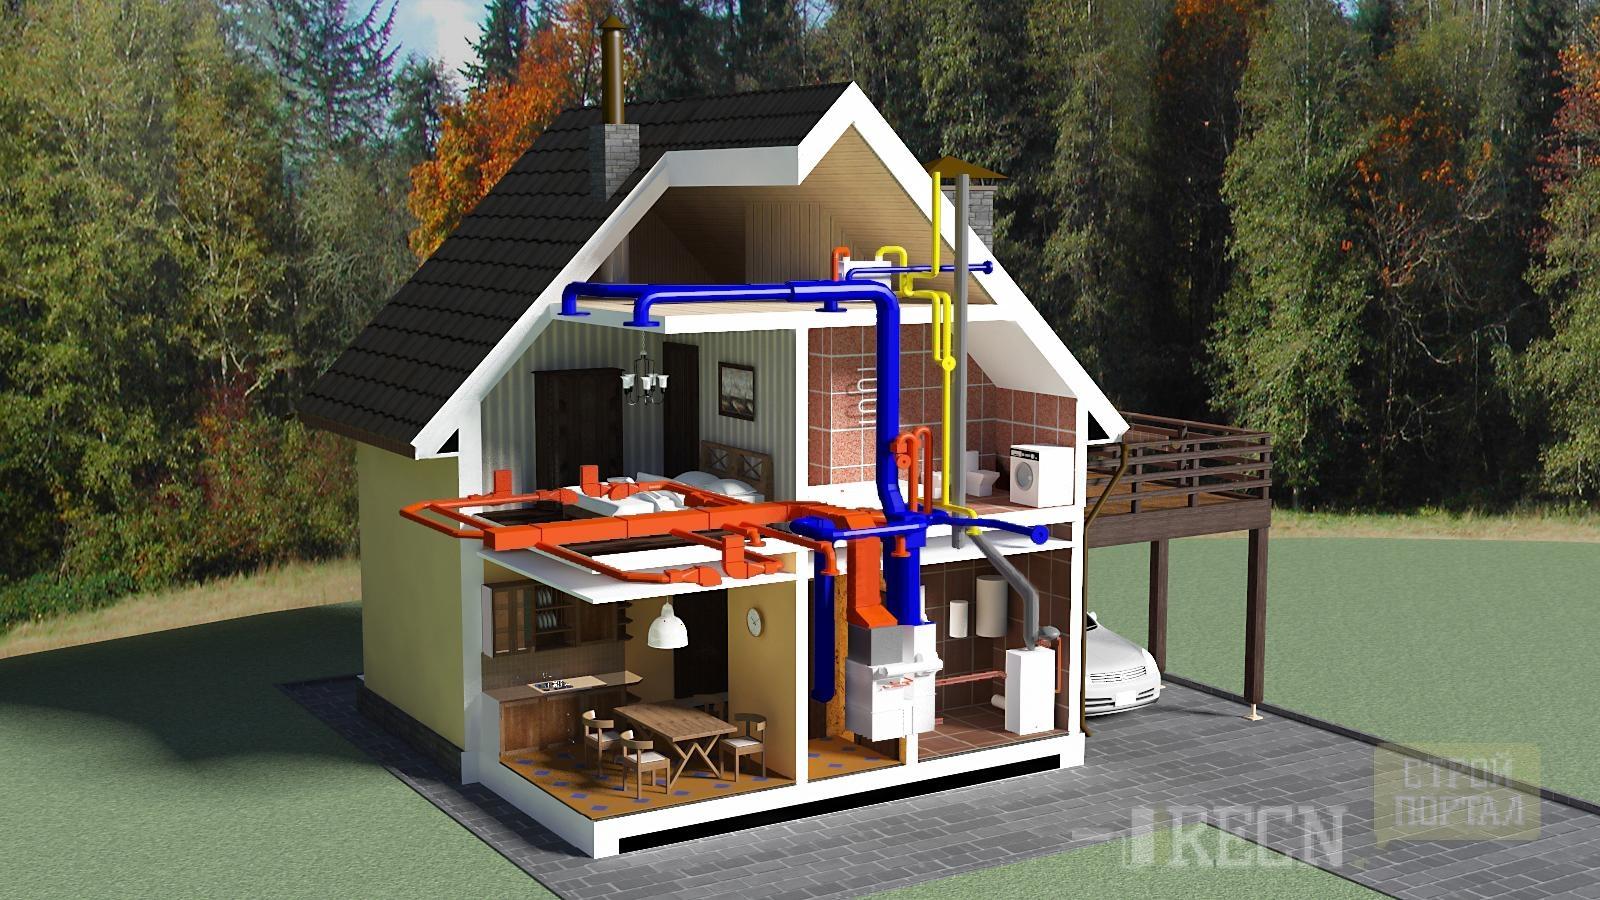 схема разводок гвс с циркуляцией многоквартирного дома